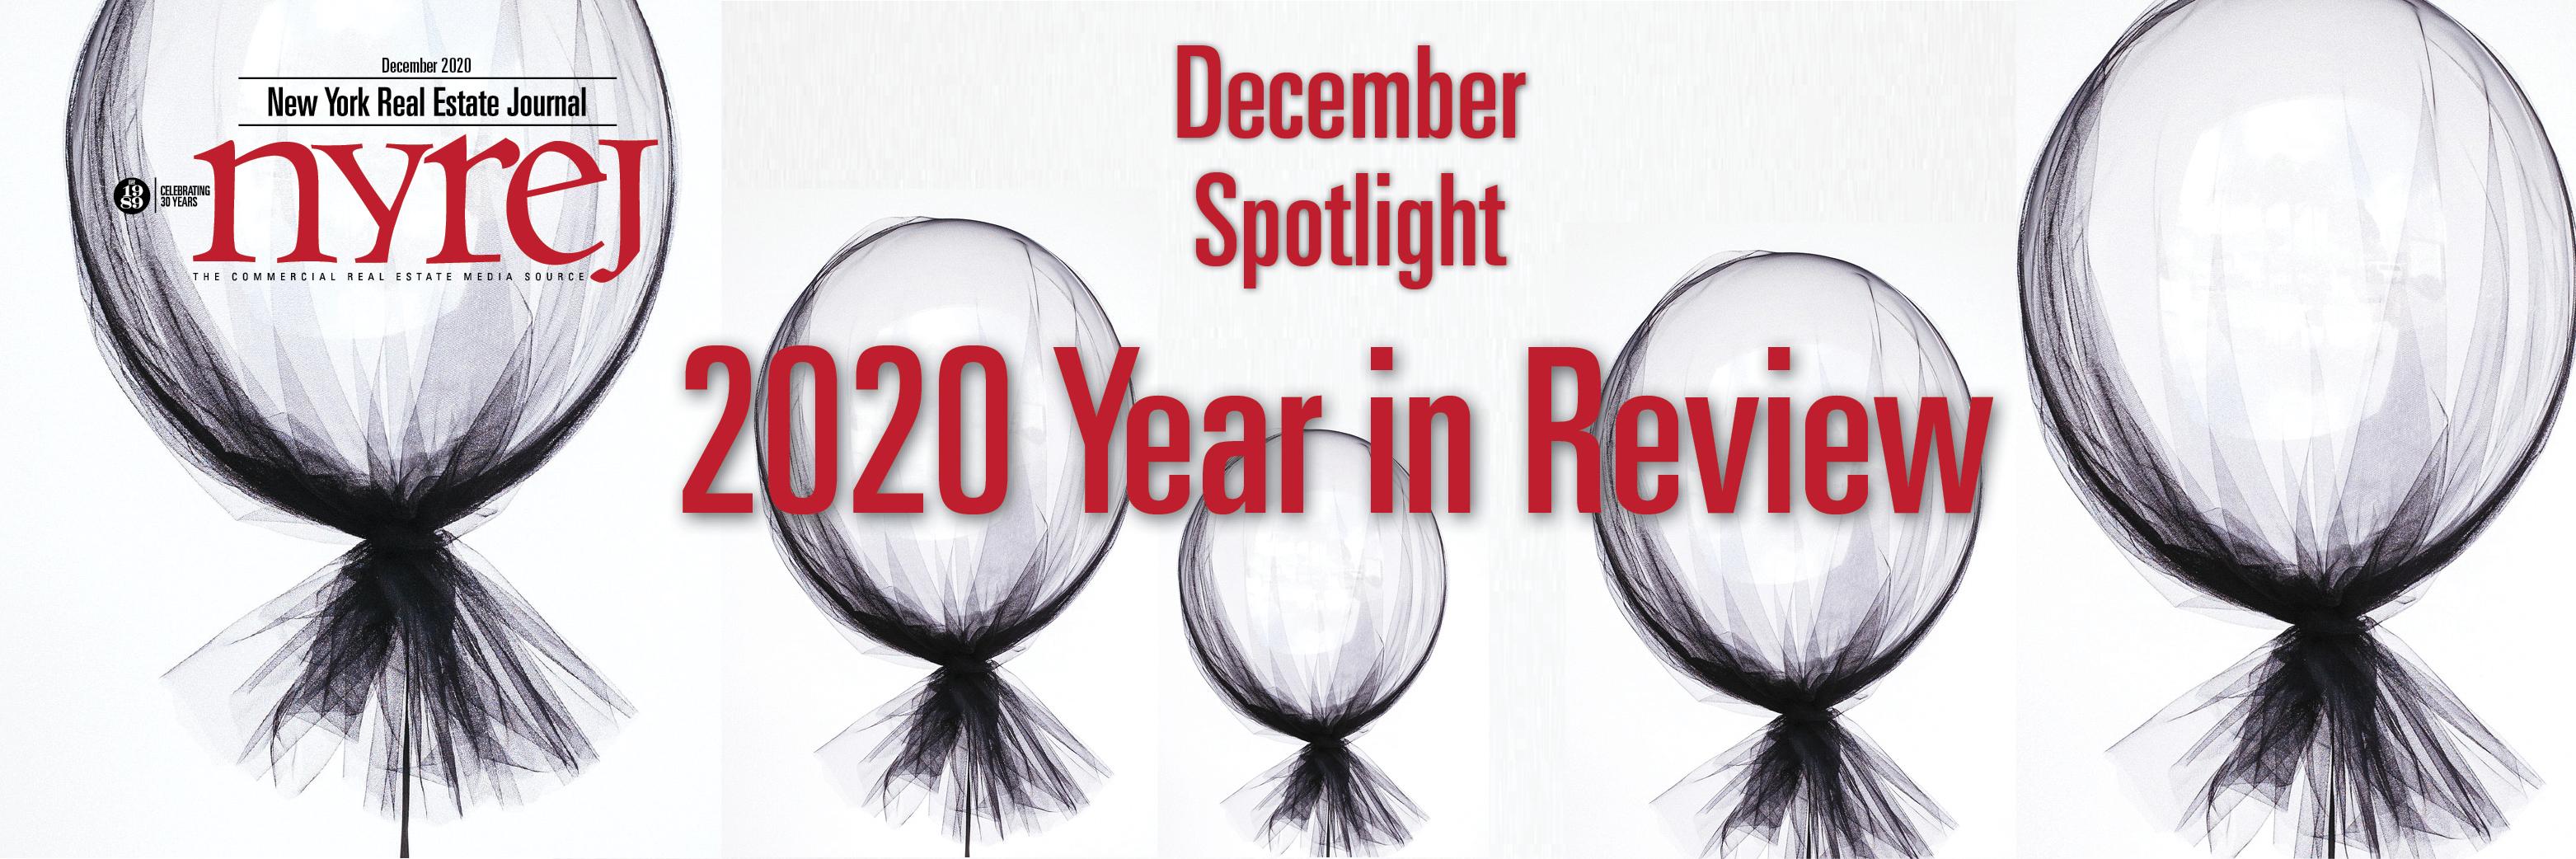 December Spotlight: <br> 2020 Year in Review